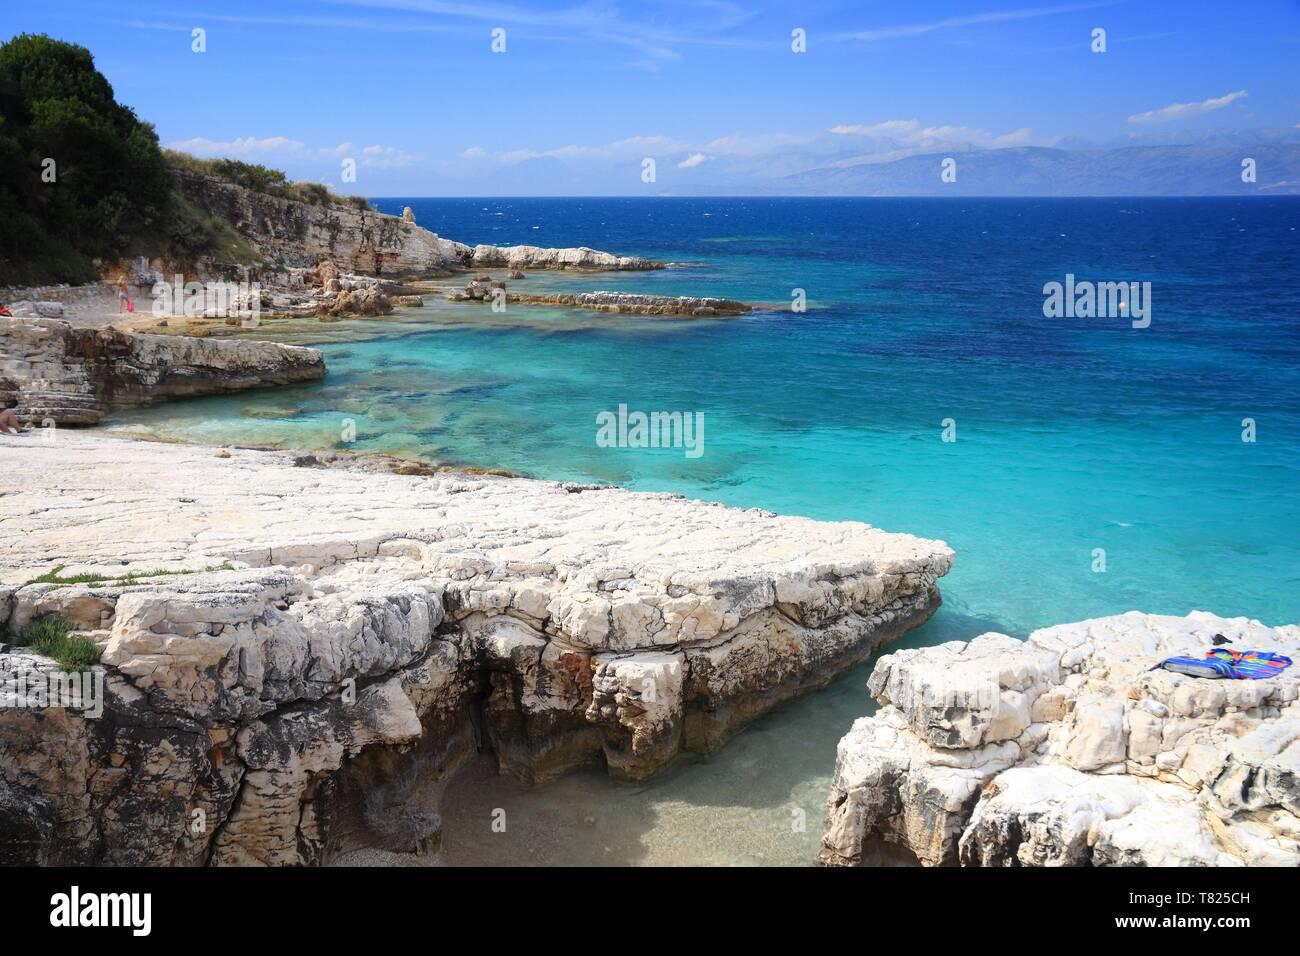 Kassiopi Beach in Corfu island, Greece. Mediterranean landscape. - Stock Image